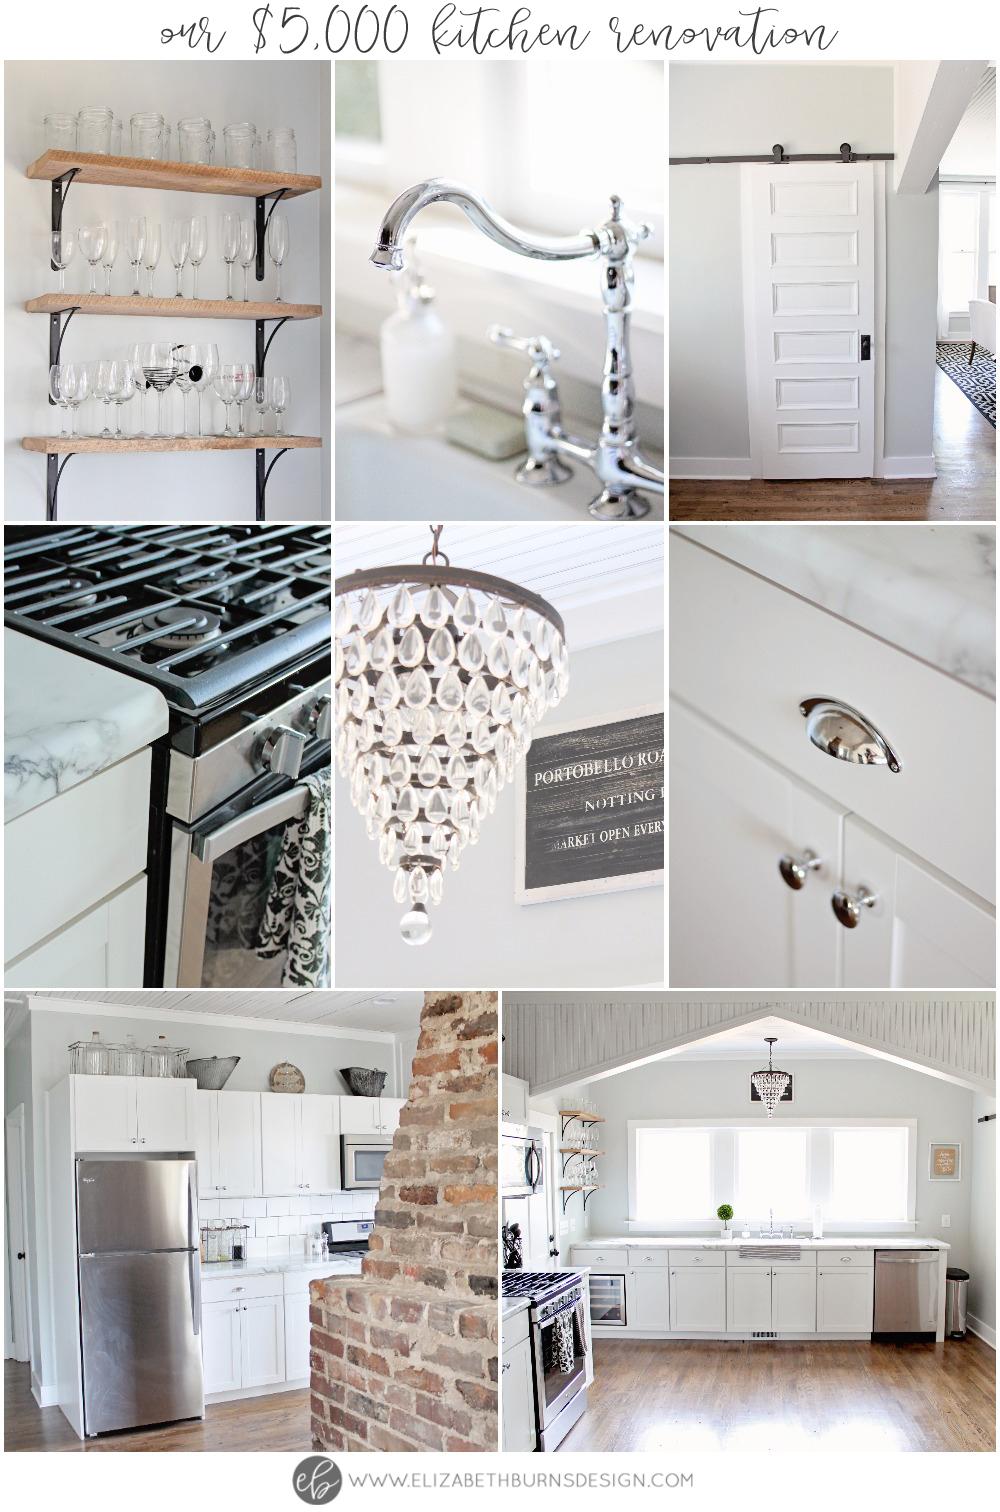 Elizabeth Burns Design | Budget Kitchen Renovation - marble countertops, white shaker cabinets, barnwood shelves, barn door - $5000 budget